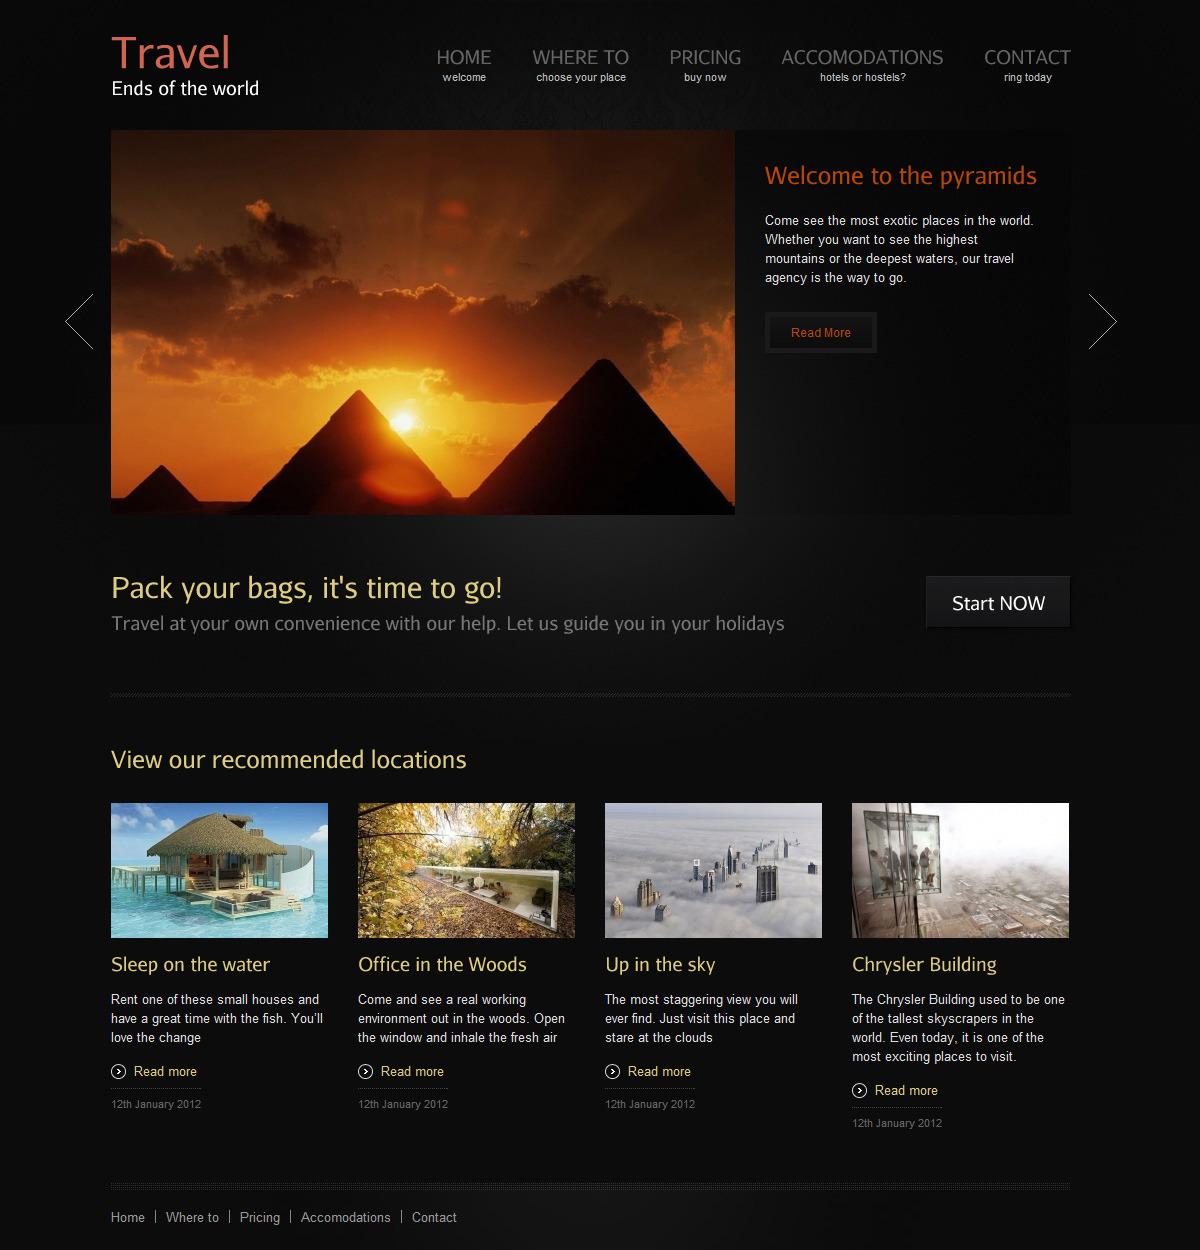 reFresh - Powerful Clean & Elegant WordPress Theme - Traveling Agency Demo - Showcase